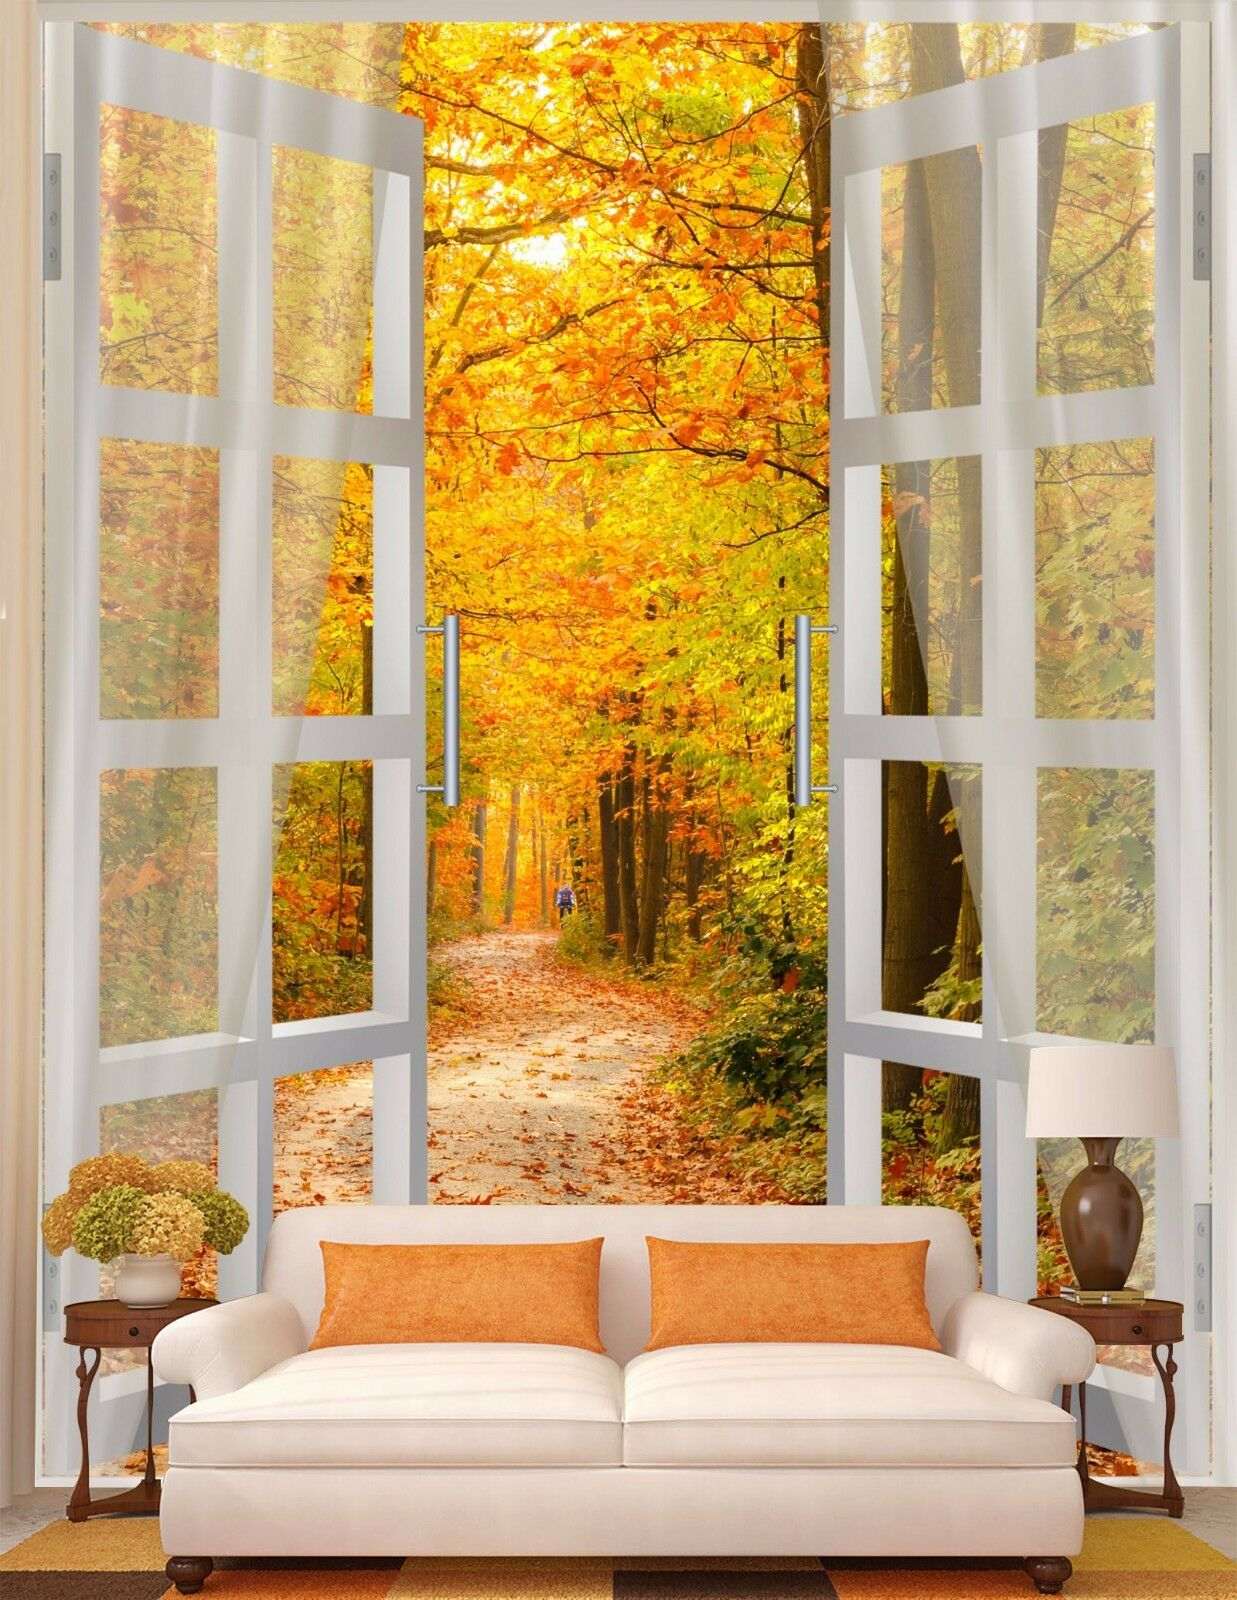 3D window view tree Wall Paper Wall Print Decal Decal Decal Wall Deco Indoor wall Mural Home 7b0d98